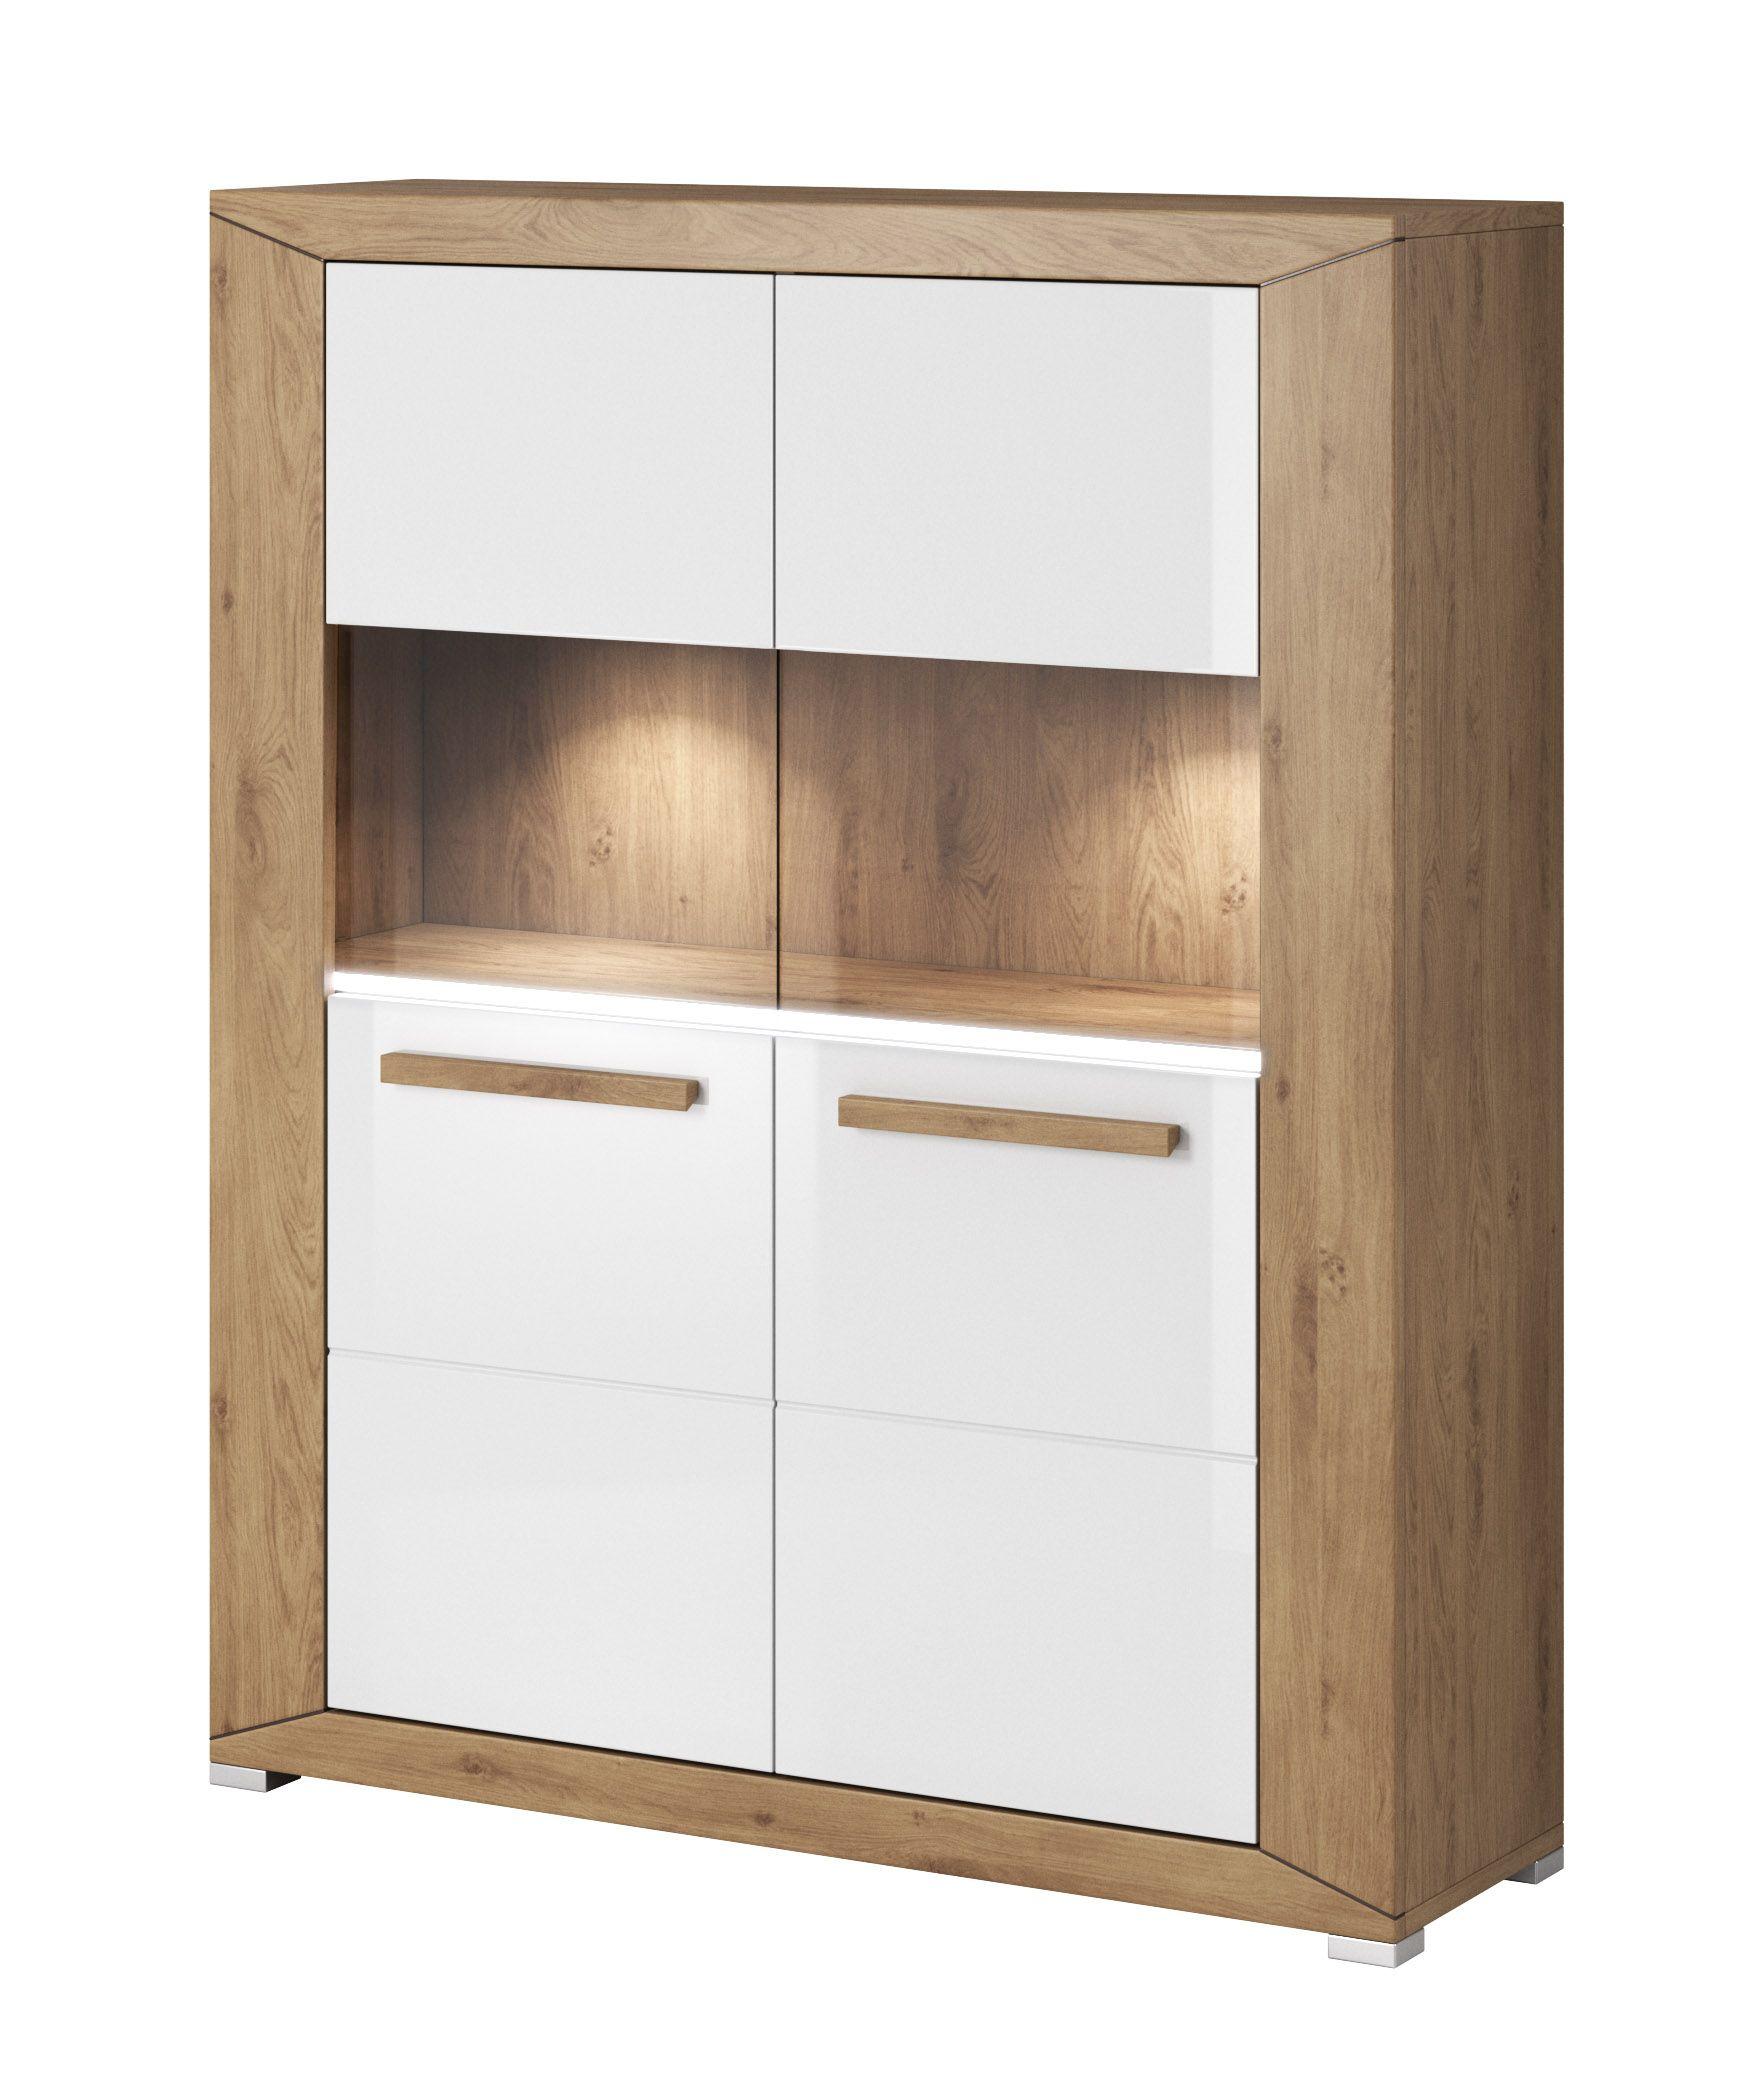 inside micke drop drawer storage ikea small units awesome amazon desk file com with frame white unit sterilite